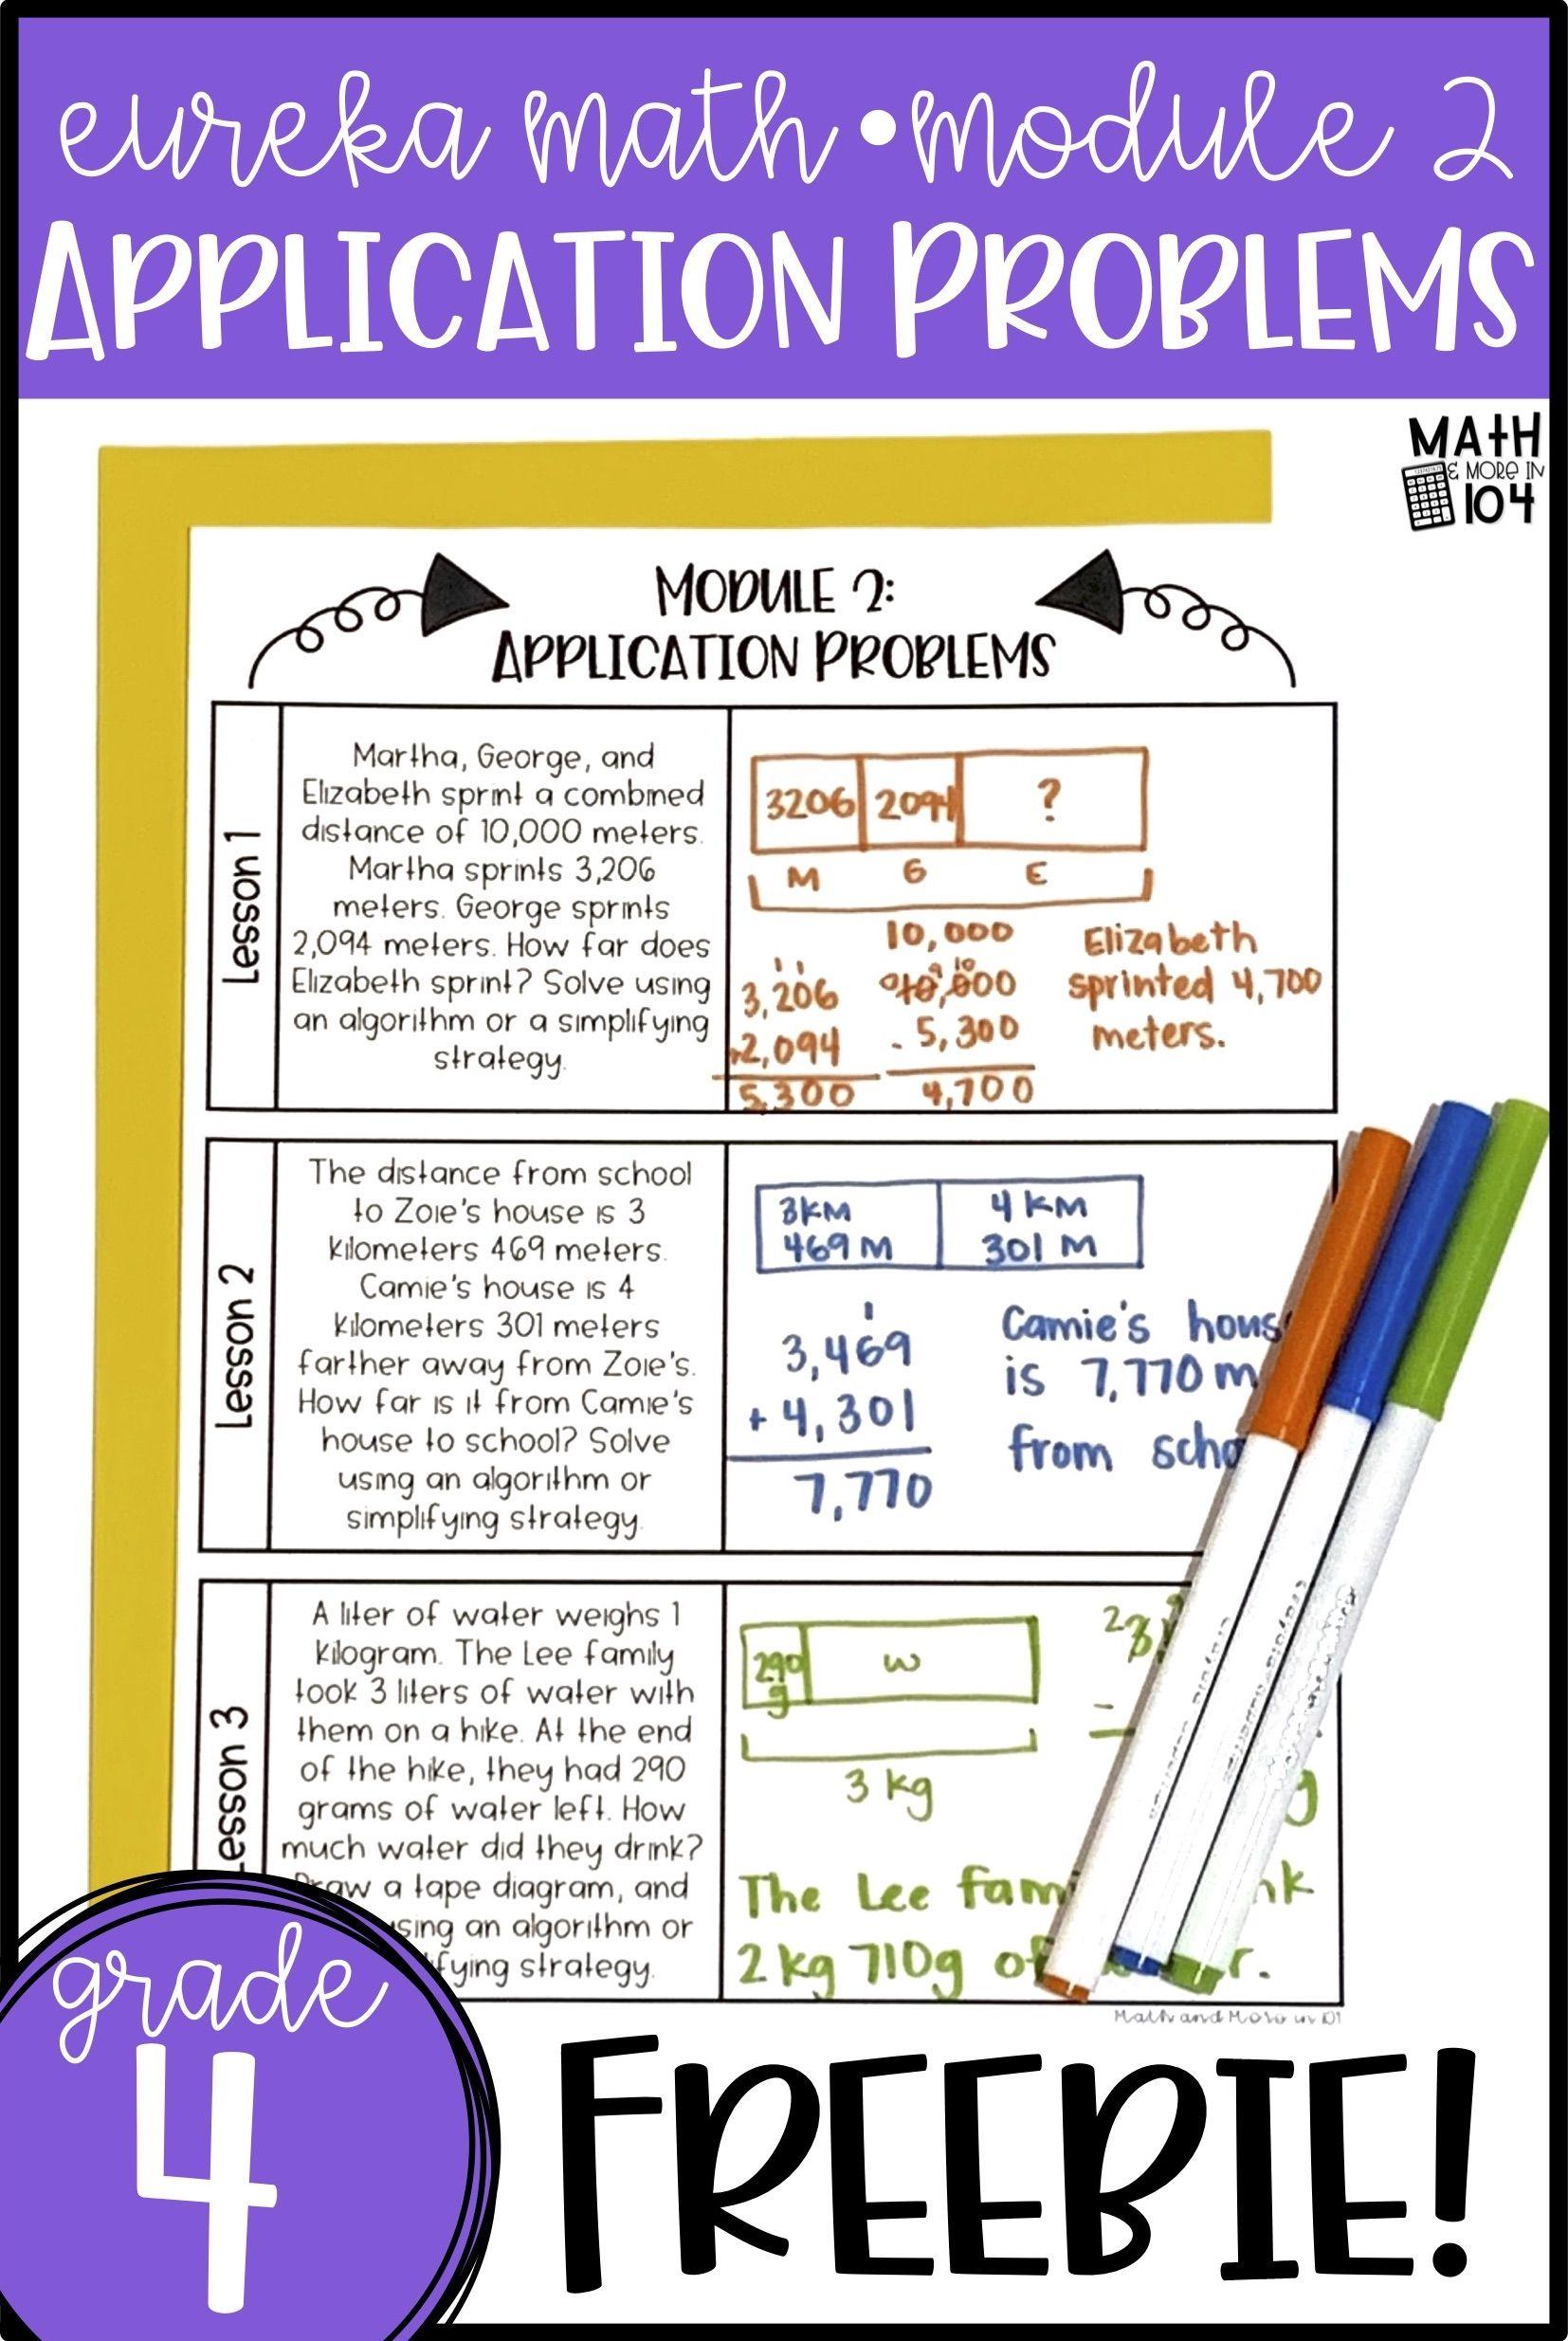 Eureka math engage ny module 2 application problems